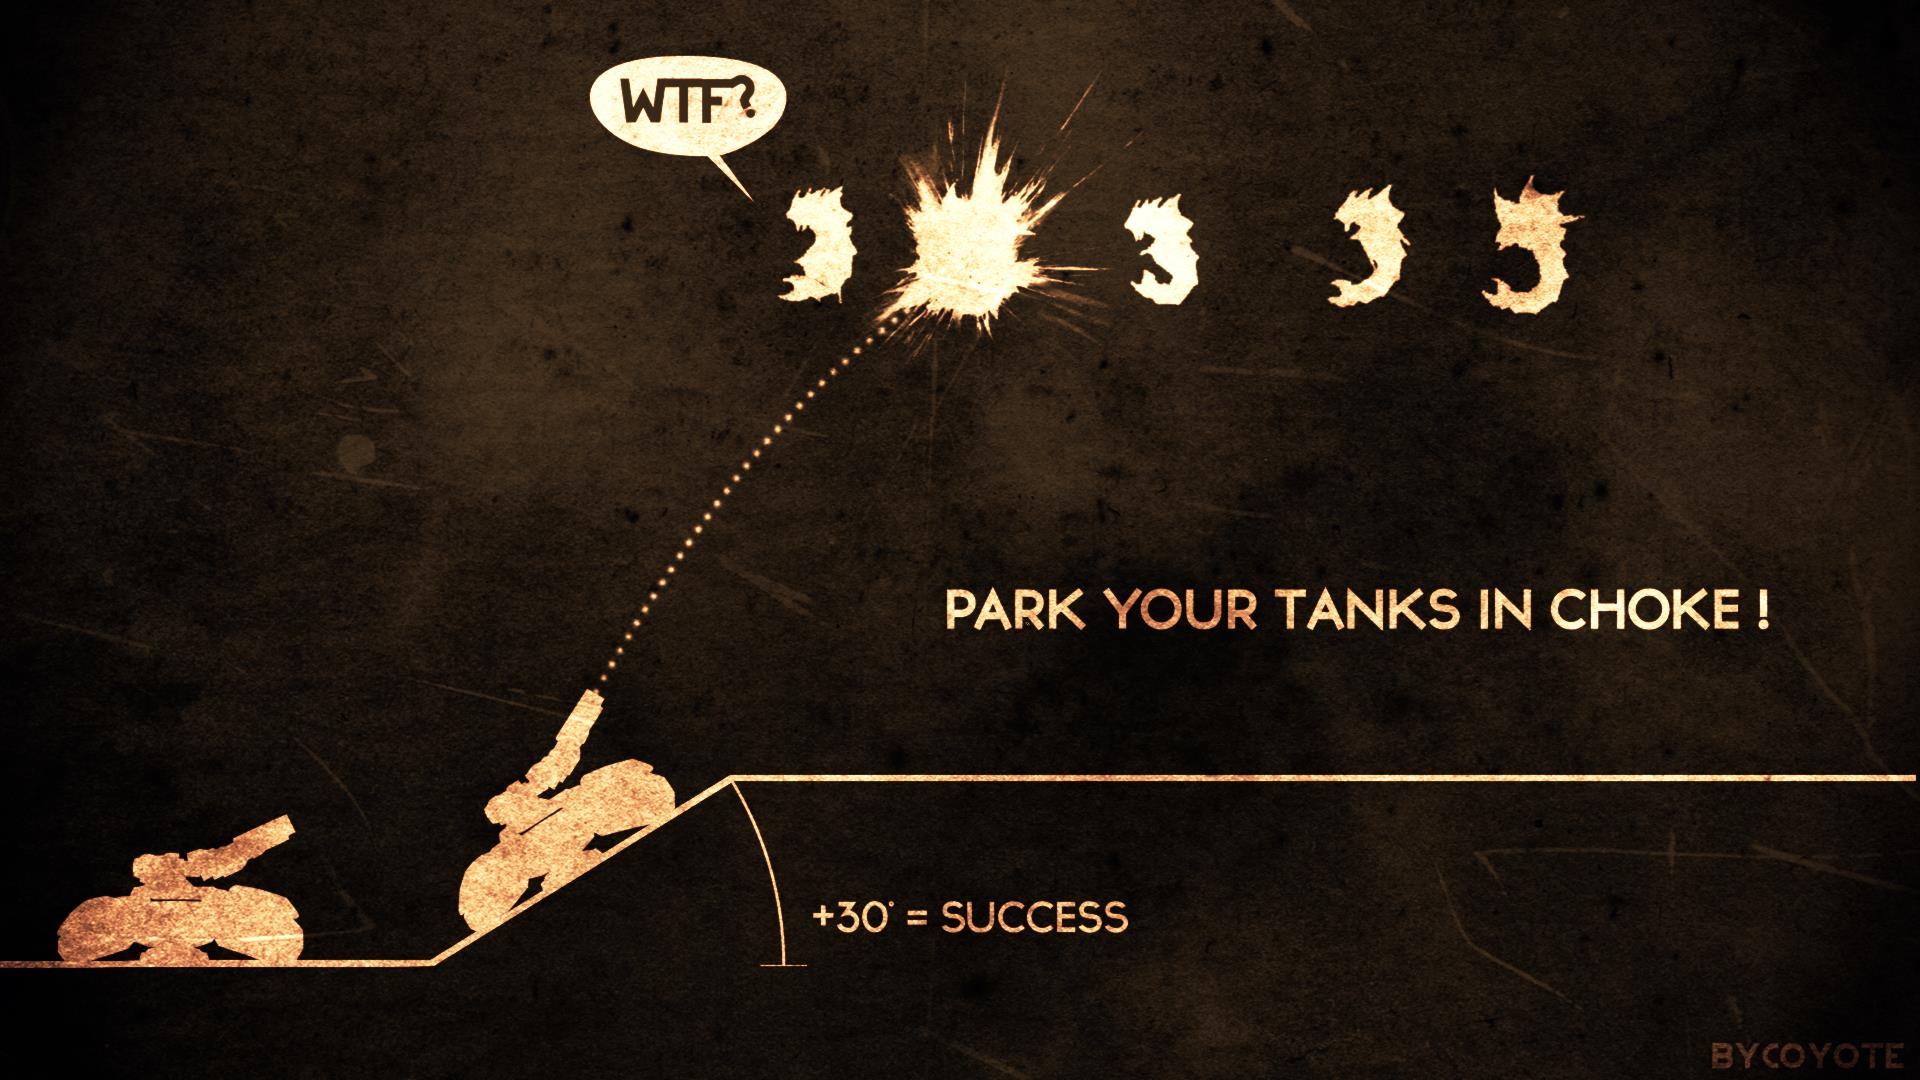 finally tanks with anti-air